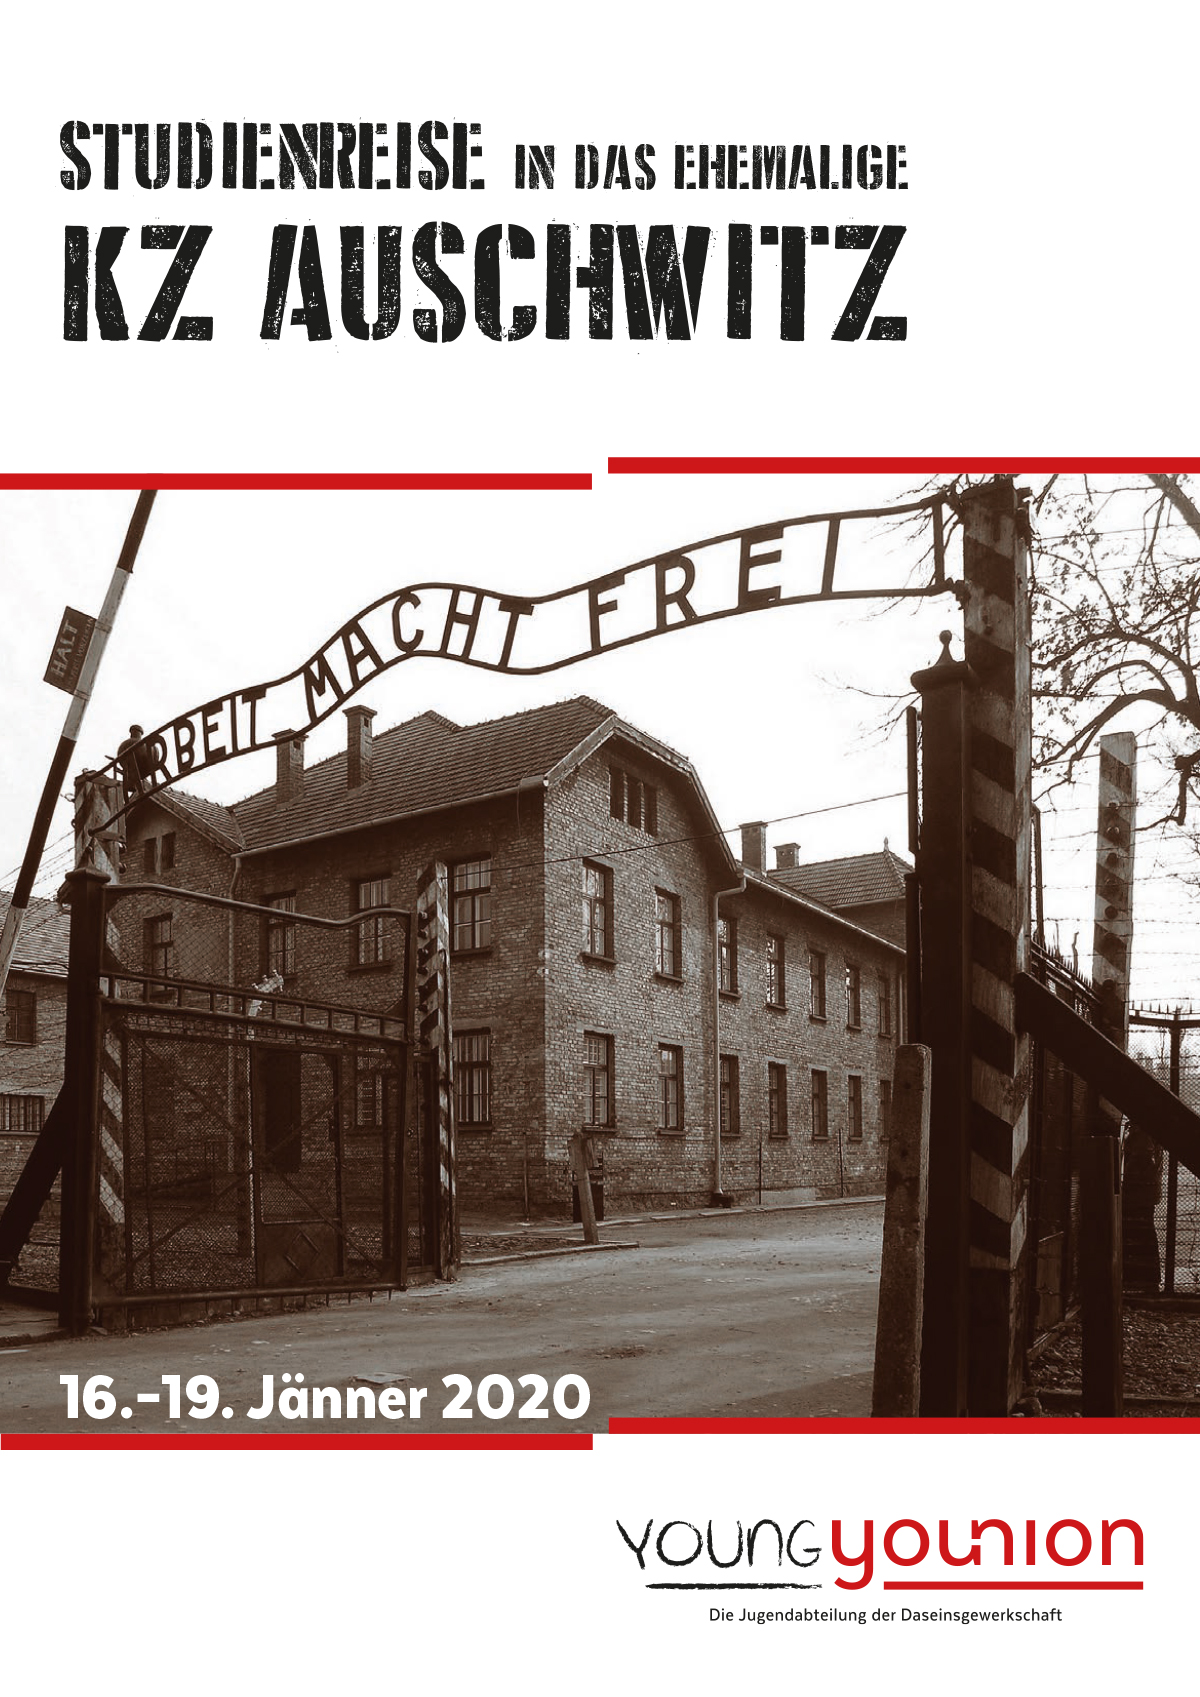 Studienreise Auschwitz 2020 - Young Younion